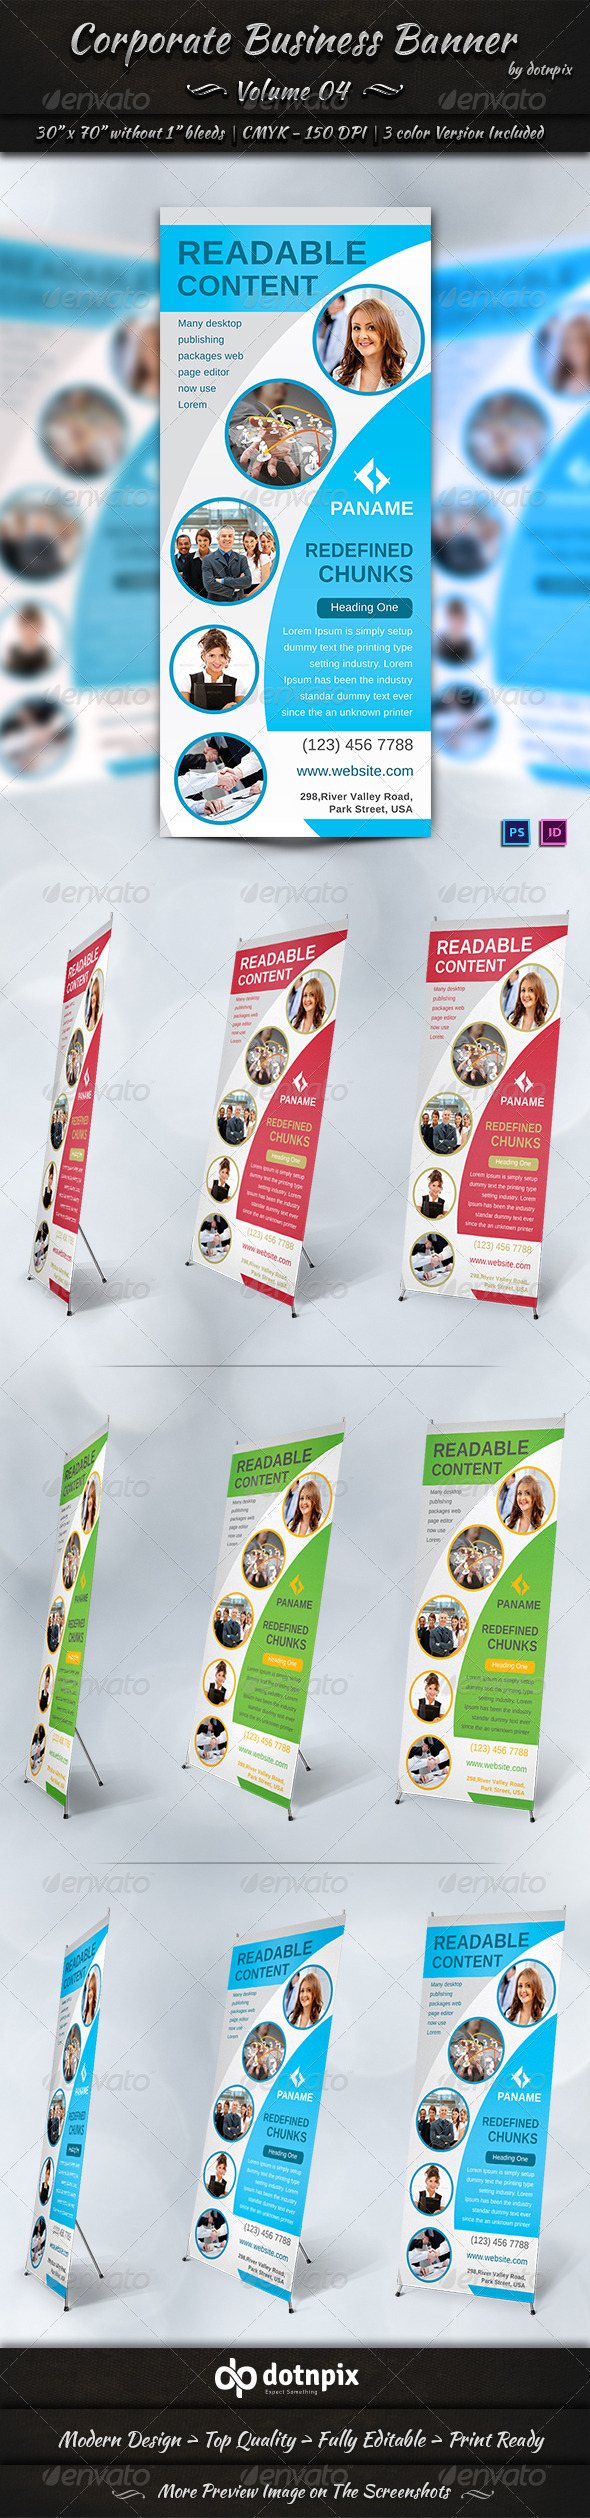 GraphicRiver Corporate Business Banner Volume 4 6899016